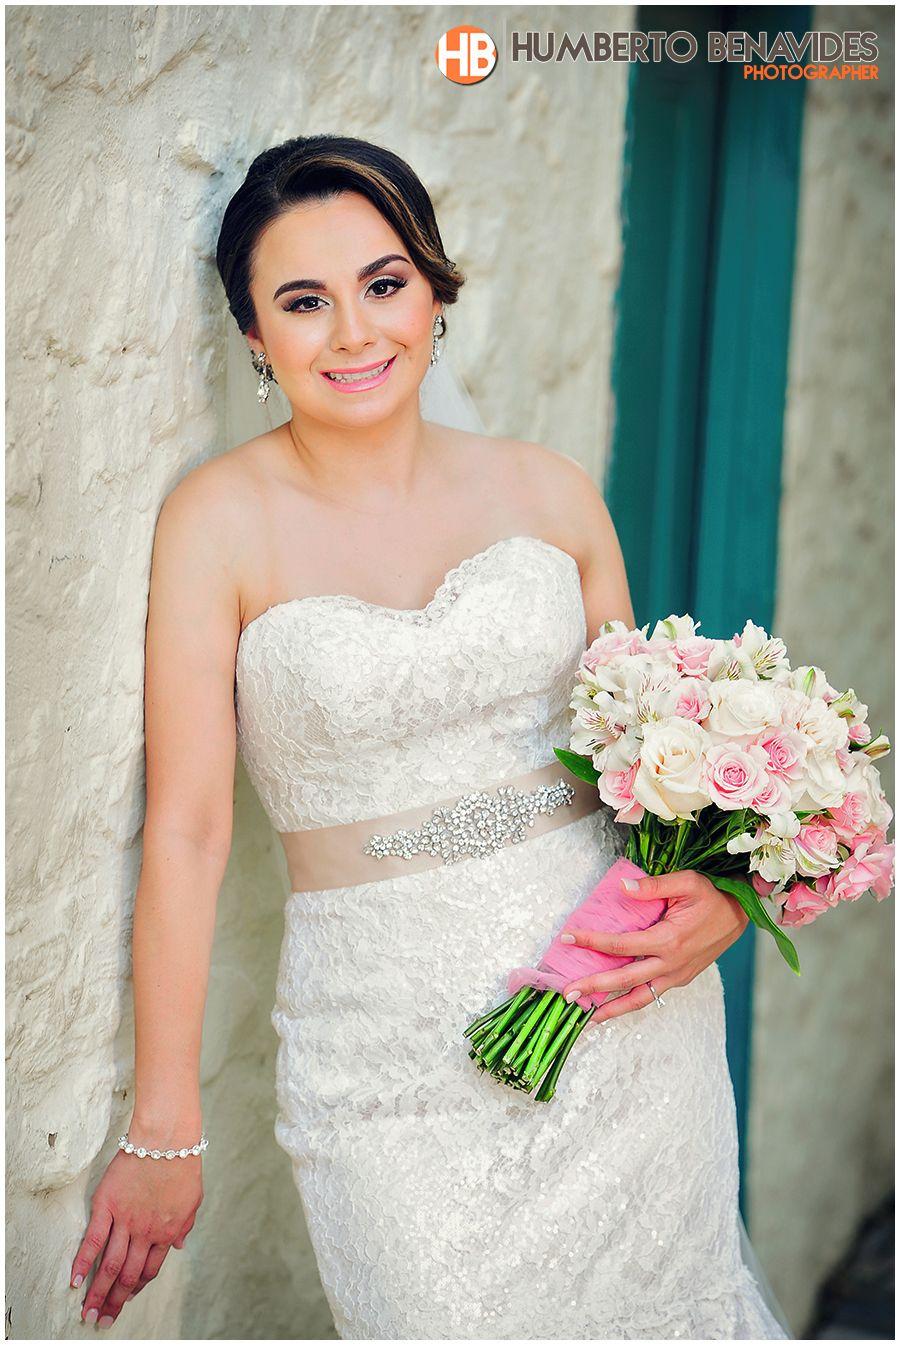 Bridal Session, Laredo, Texas, La Posada Hotel, Humberto Benavides ...